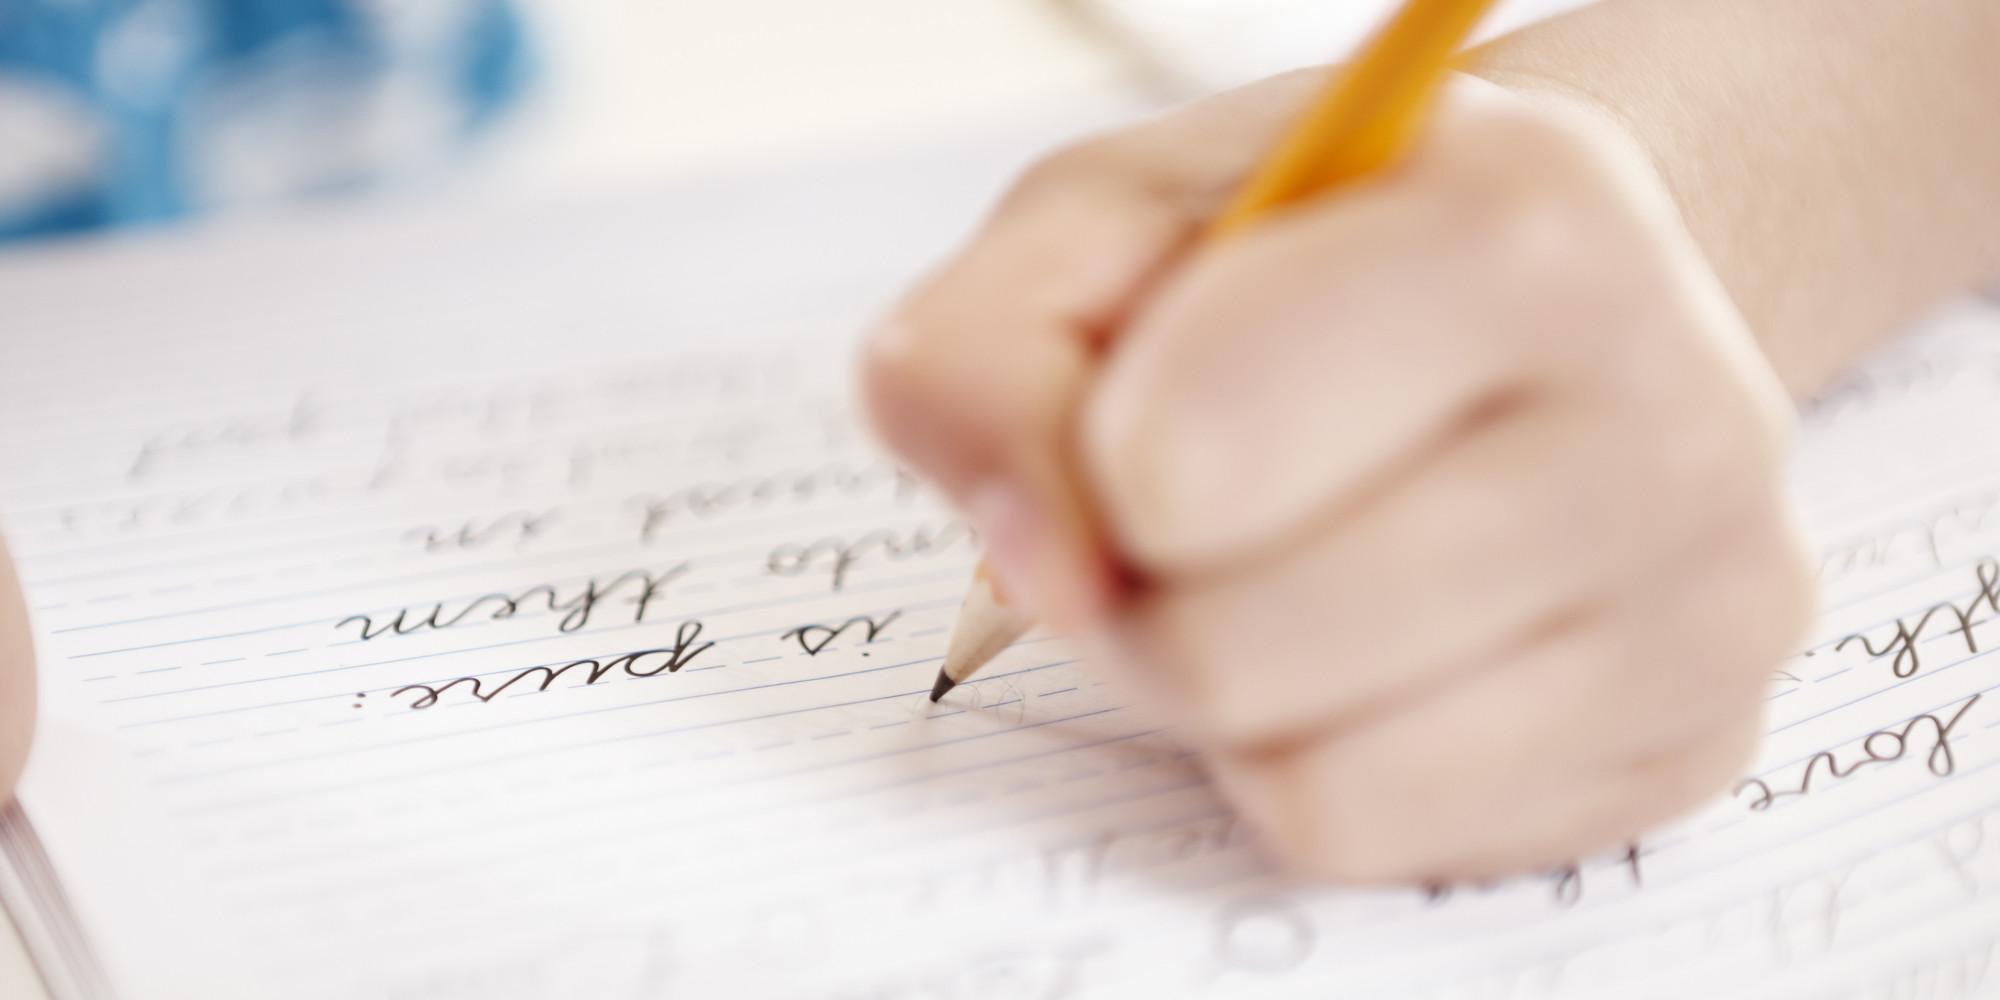 af writing